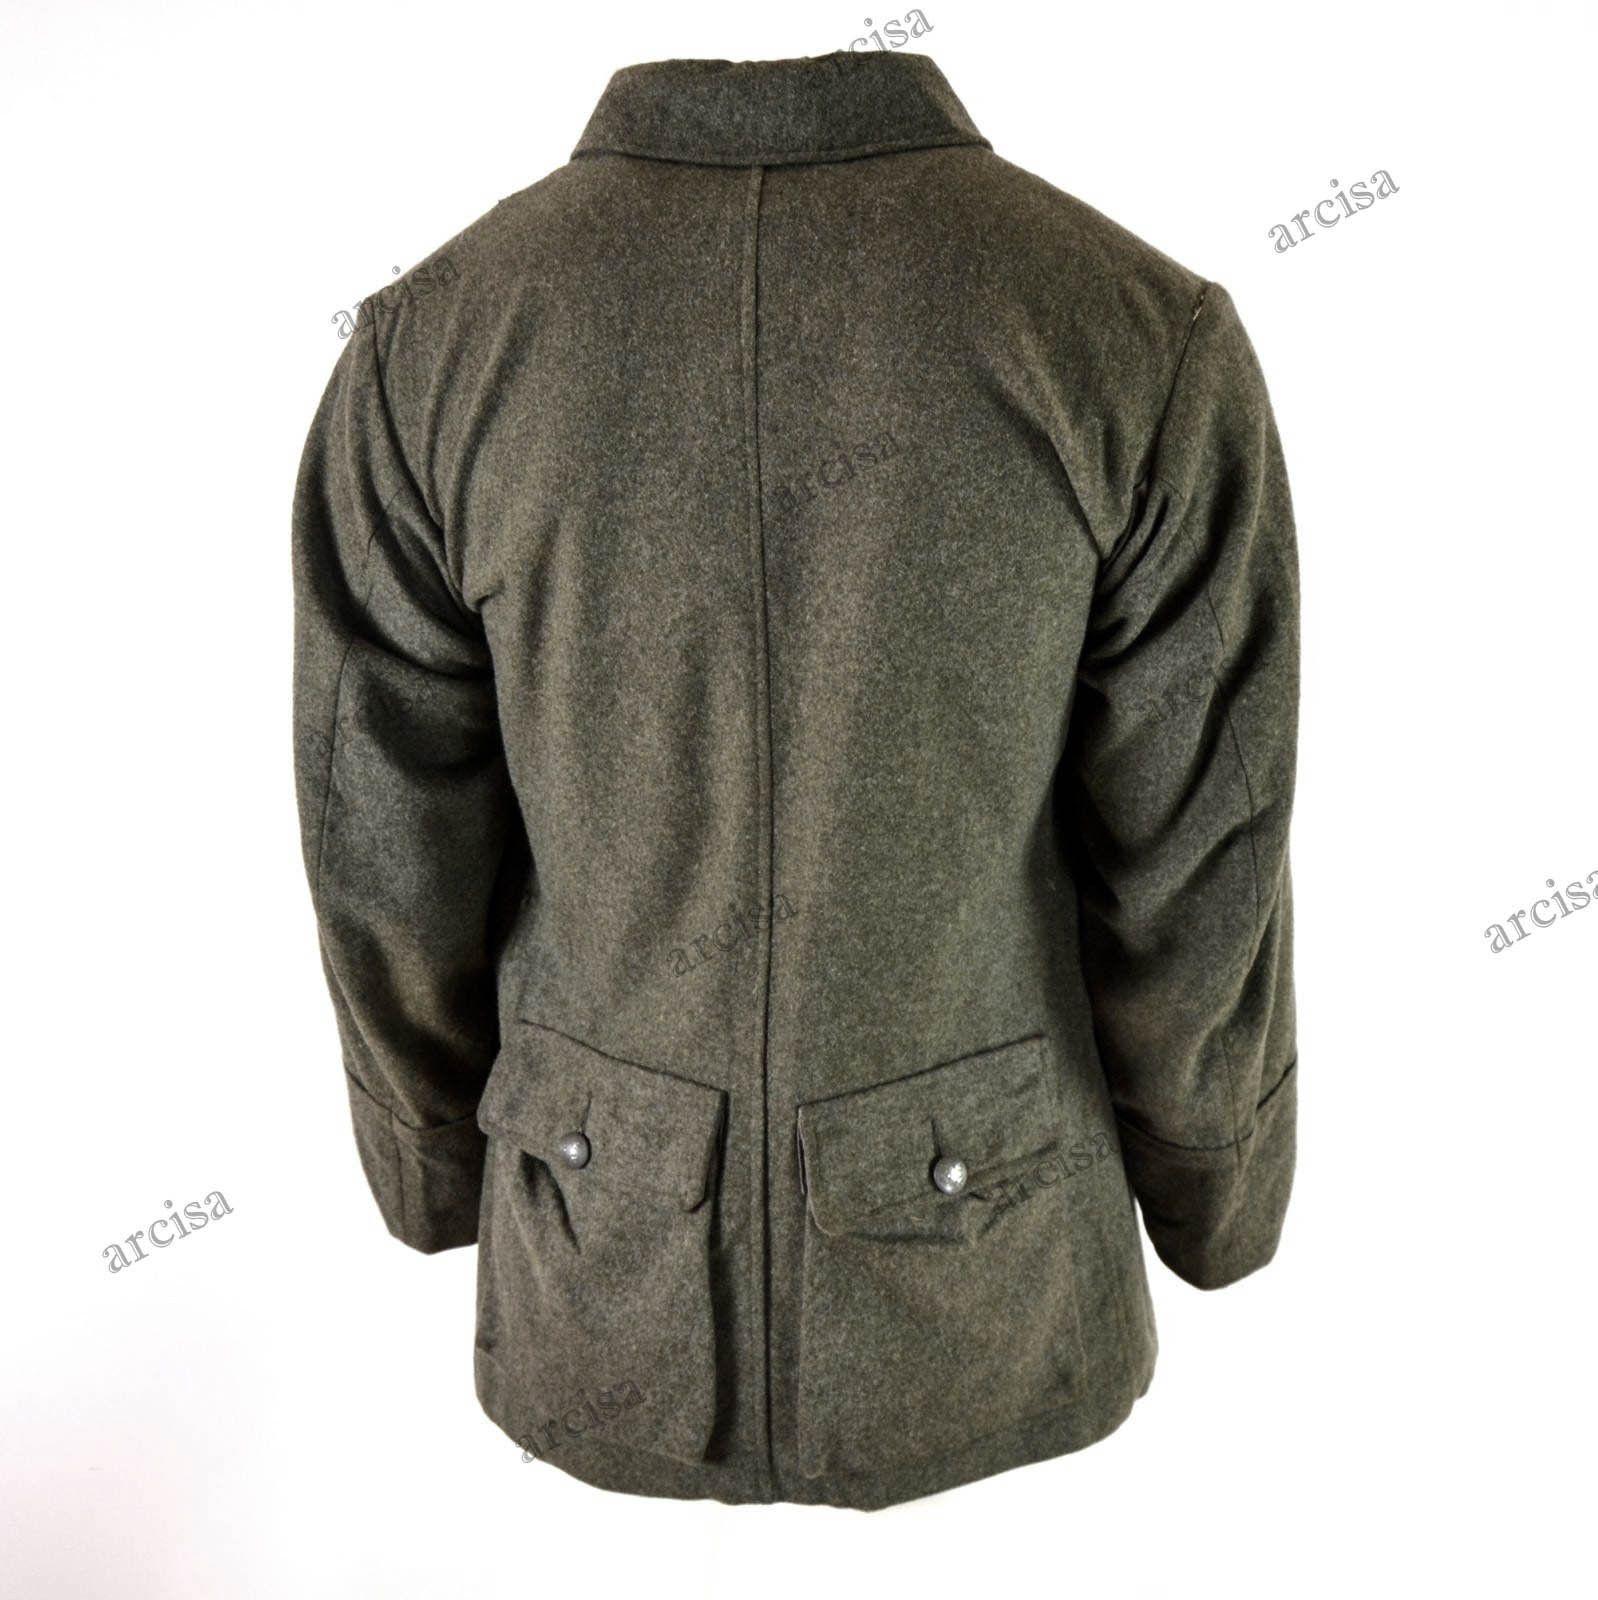 Wwii Original Vintage Swedish Army Wool Uniform Jacket M39 1940 039 S Uniform Swedish Army Jackets Wool Shirt